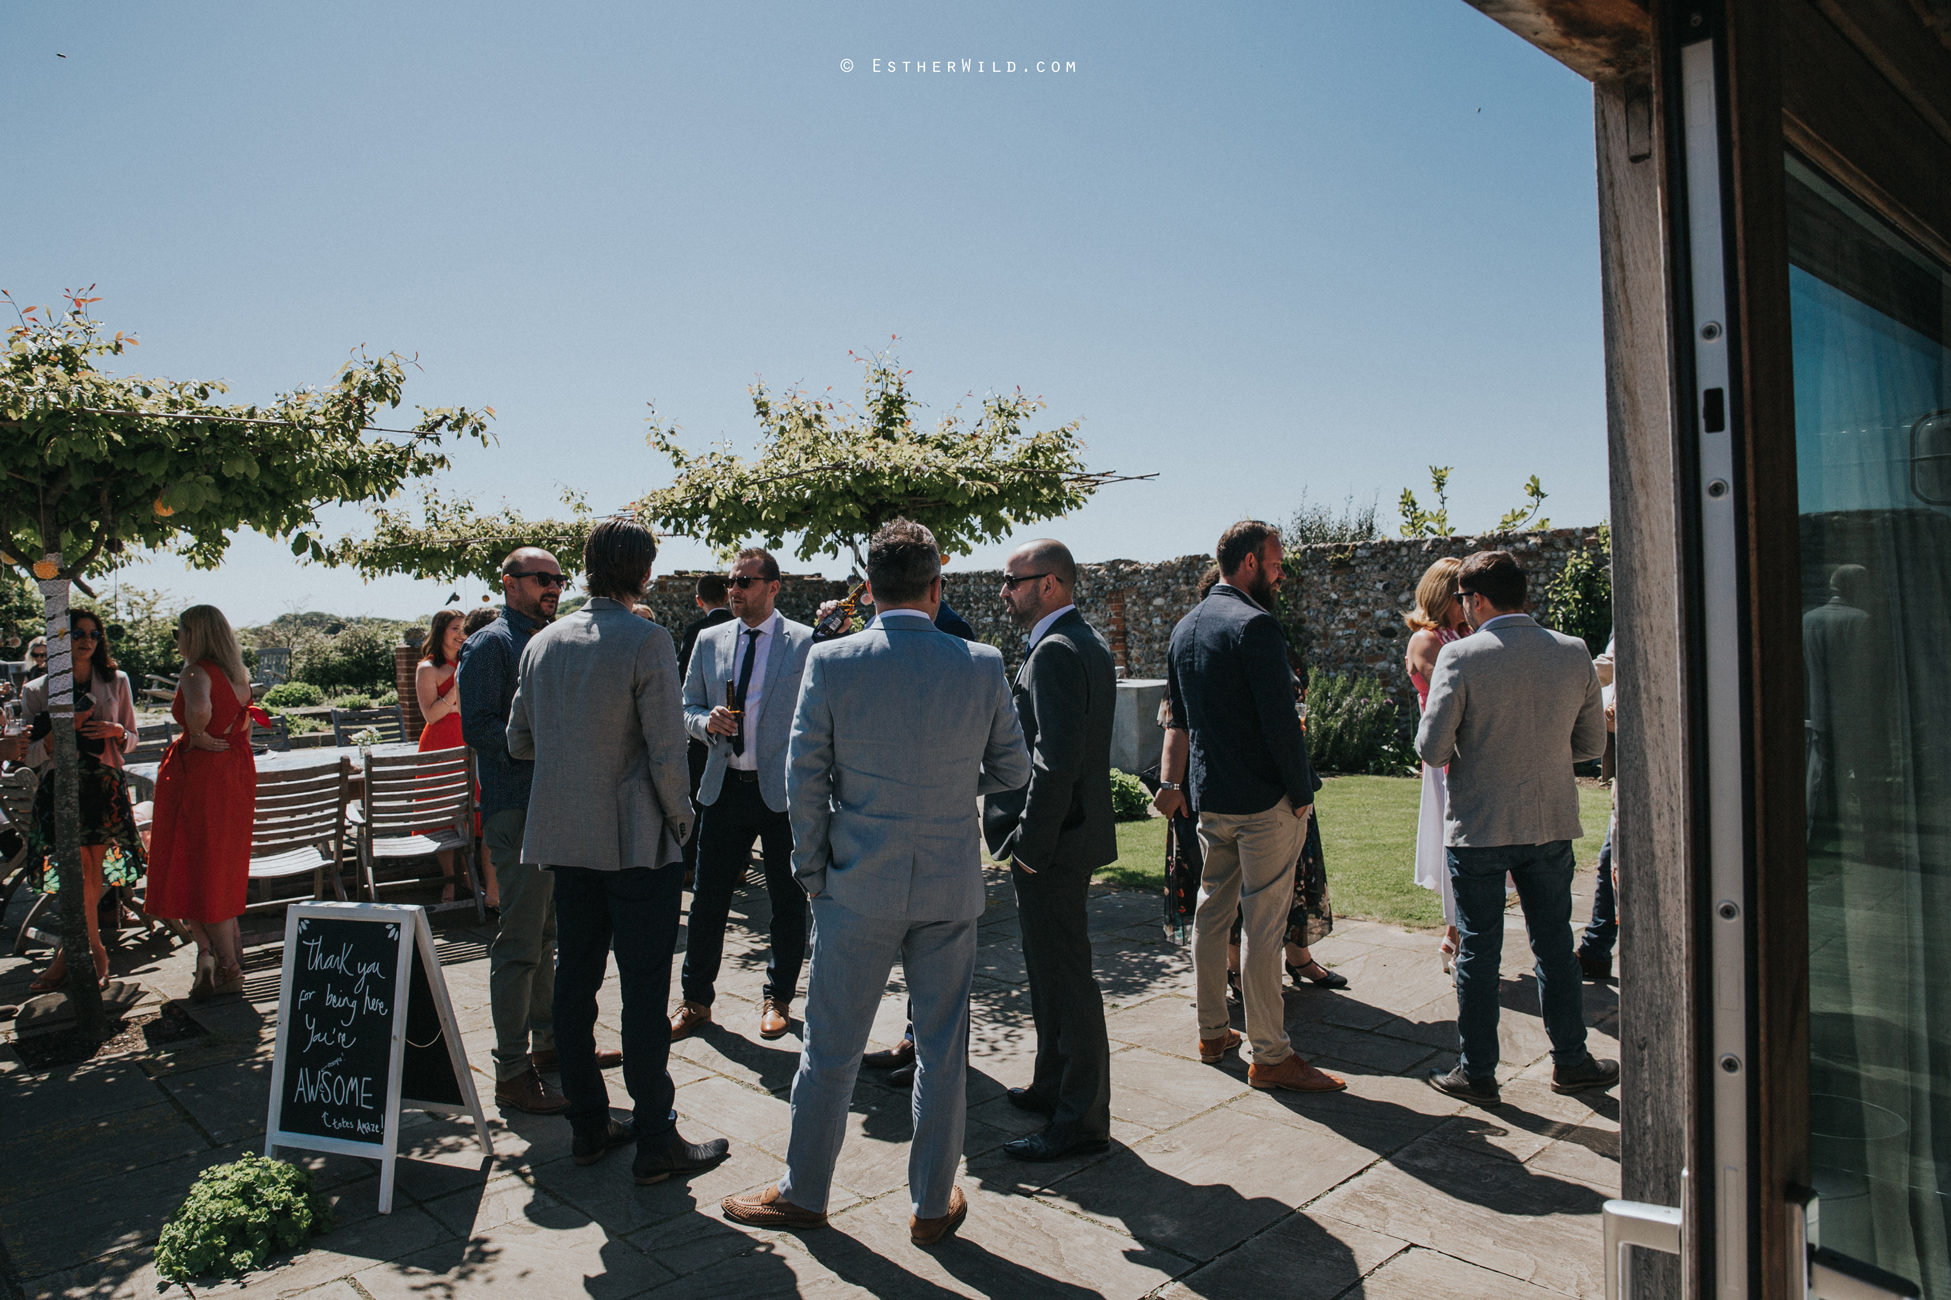 IMG_0414Cley_Barn_Drift_Norfolk_Coast_Wedding_Copyright_Esther_Wild_Photographer_.jpg